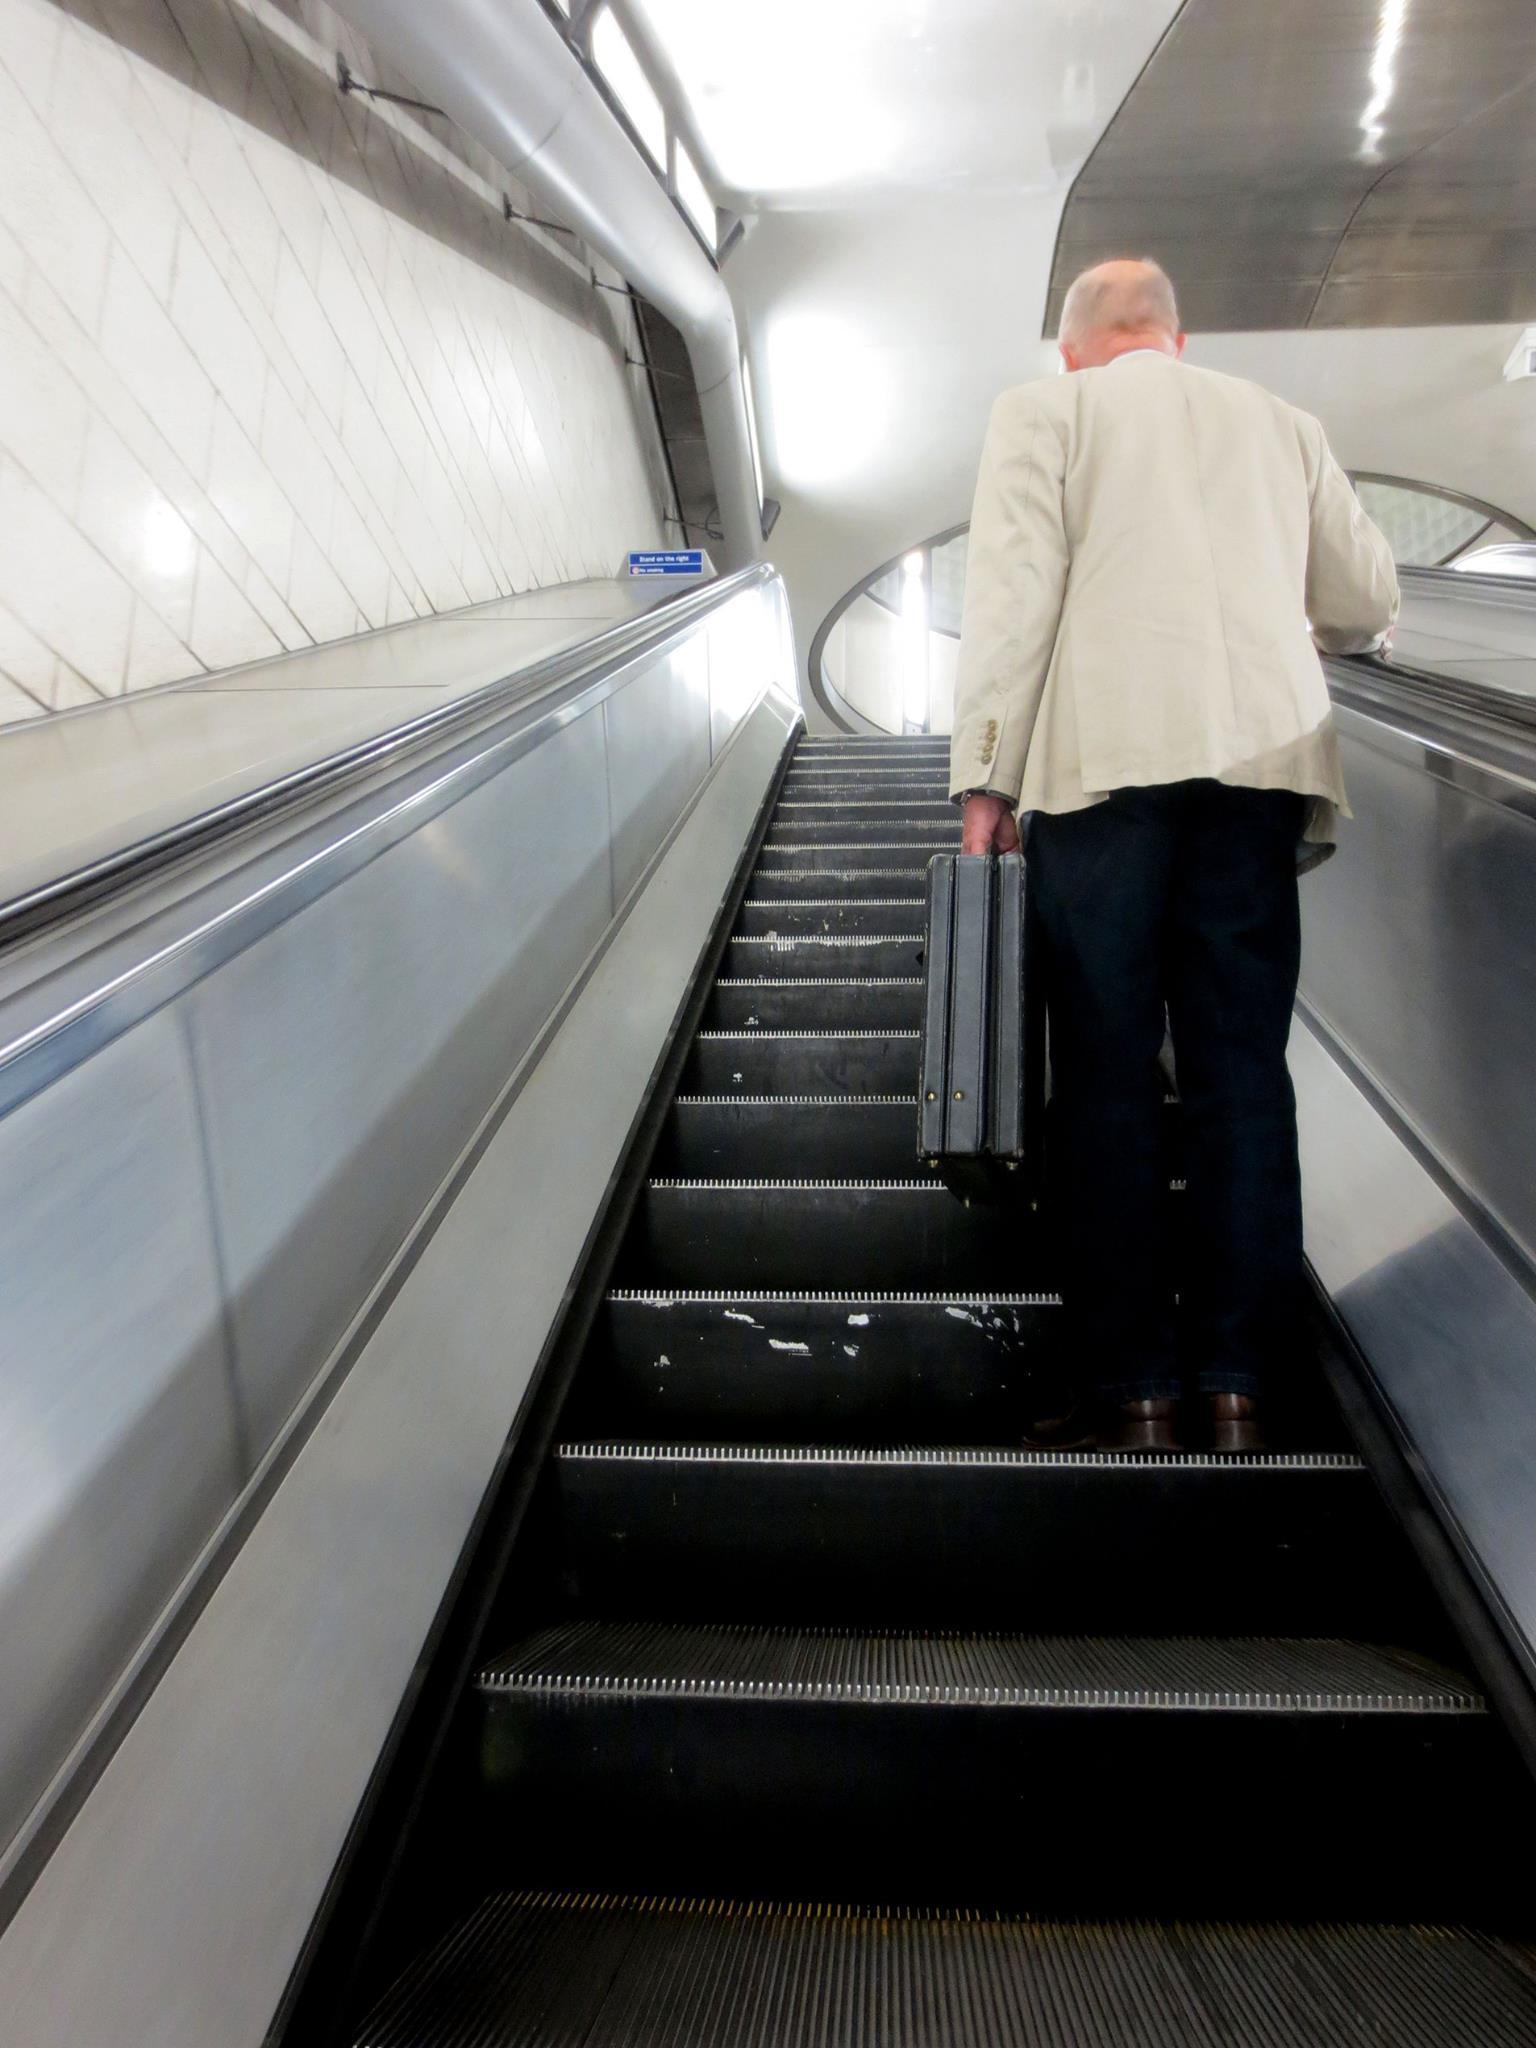 Escalators, escalators, escalators